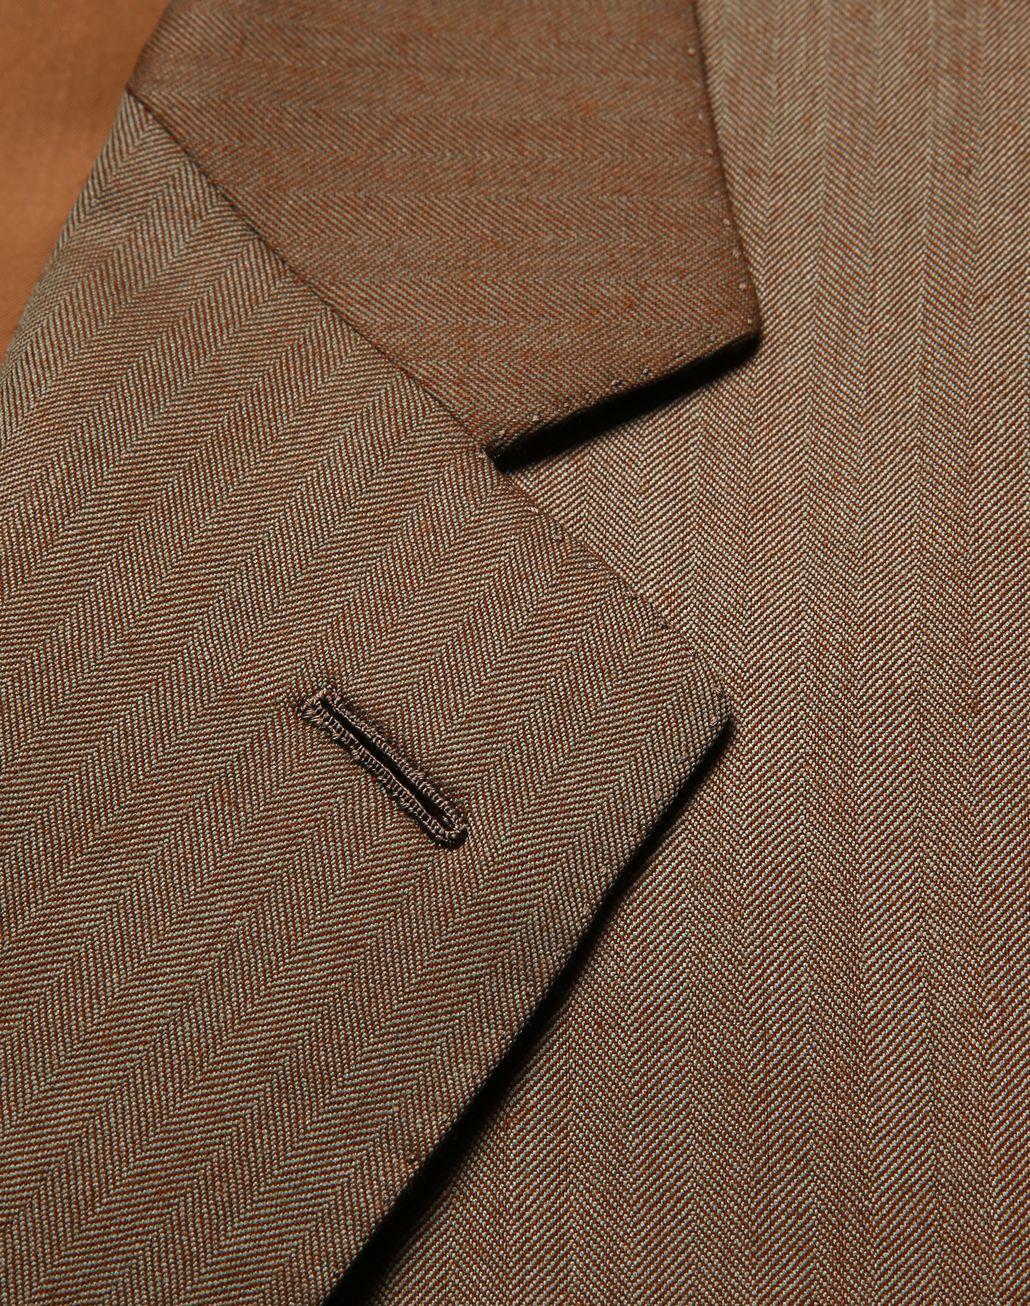 BRIONI Camel Herringbone Parioli Suit Suits & Jackets Man e